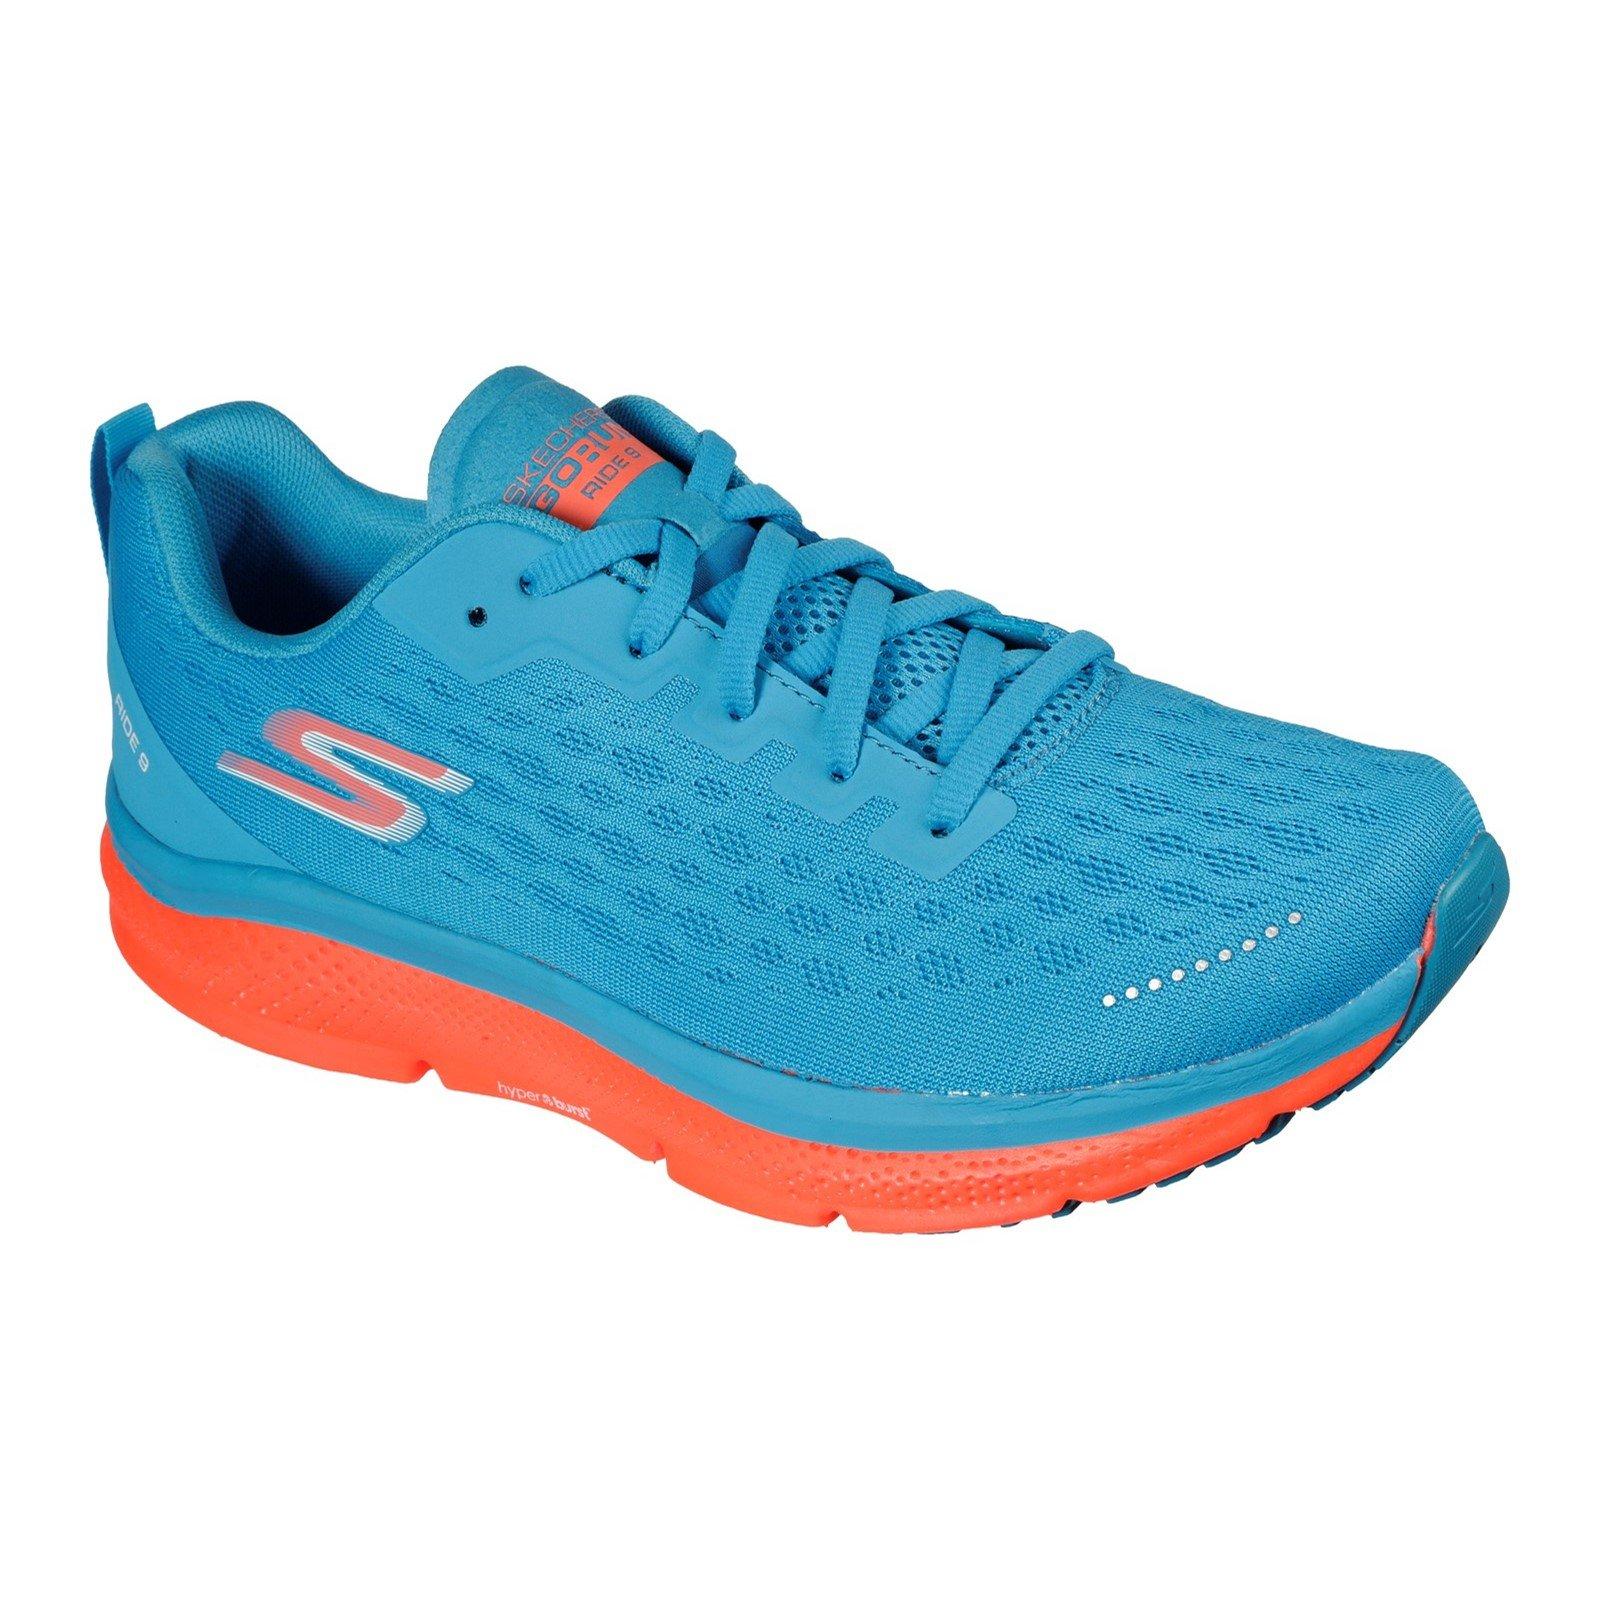 Skechers Men's Go Run Ride 9 Trainer Various Colours 32701 - Blue/Coral 8